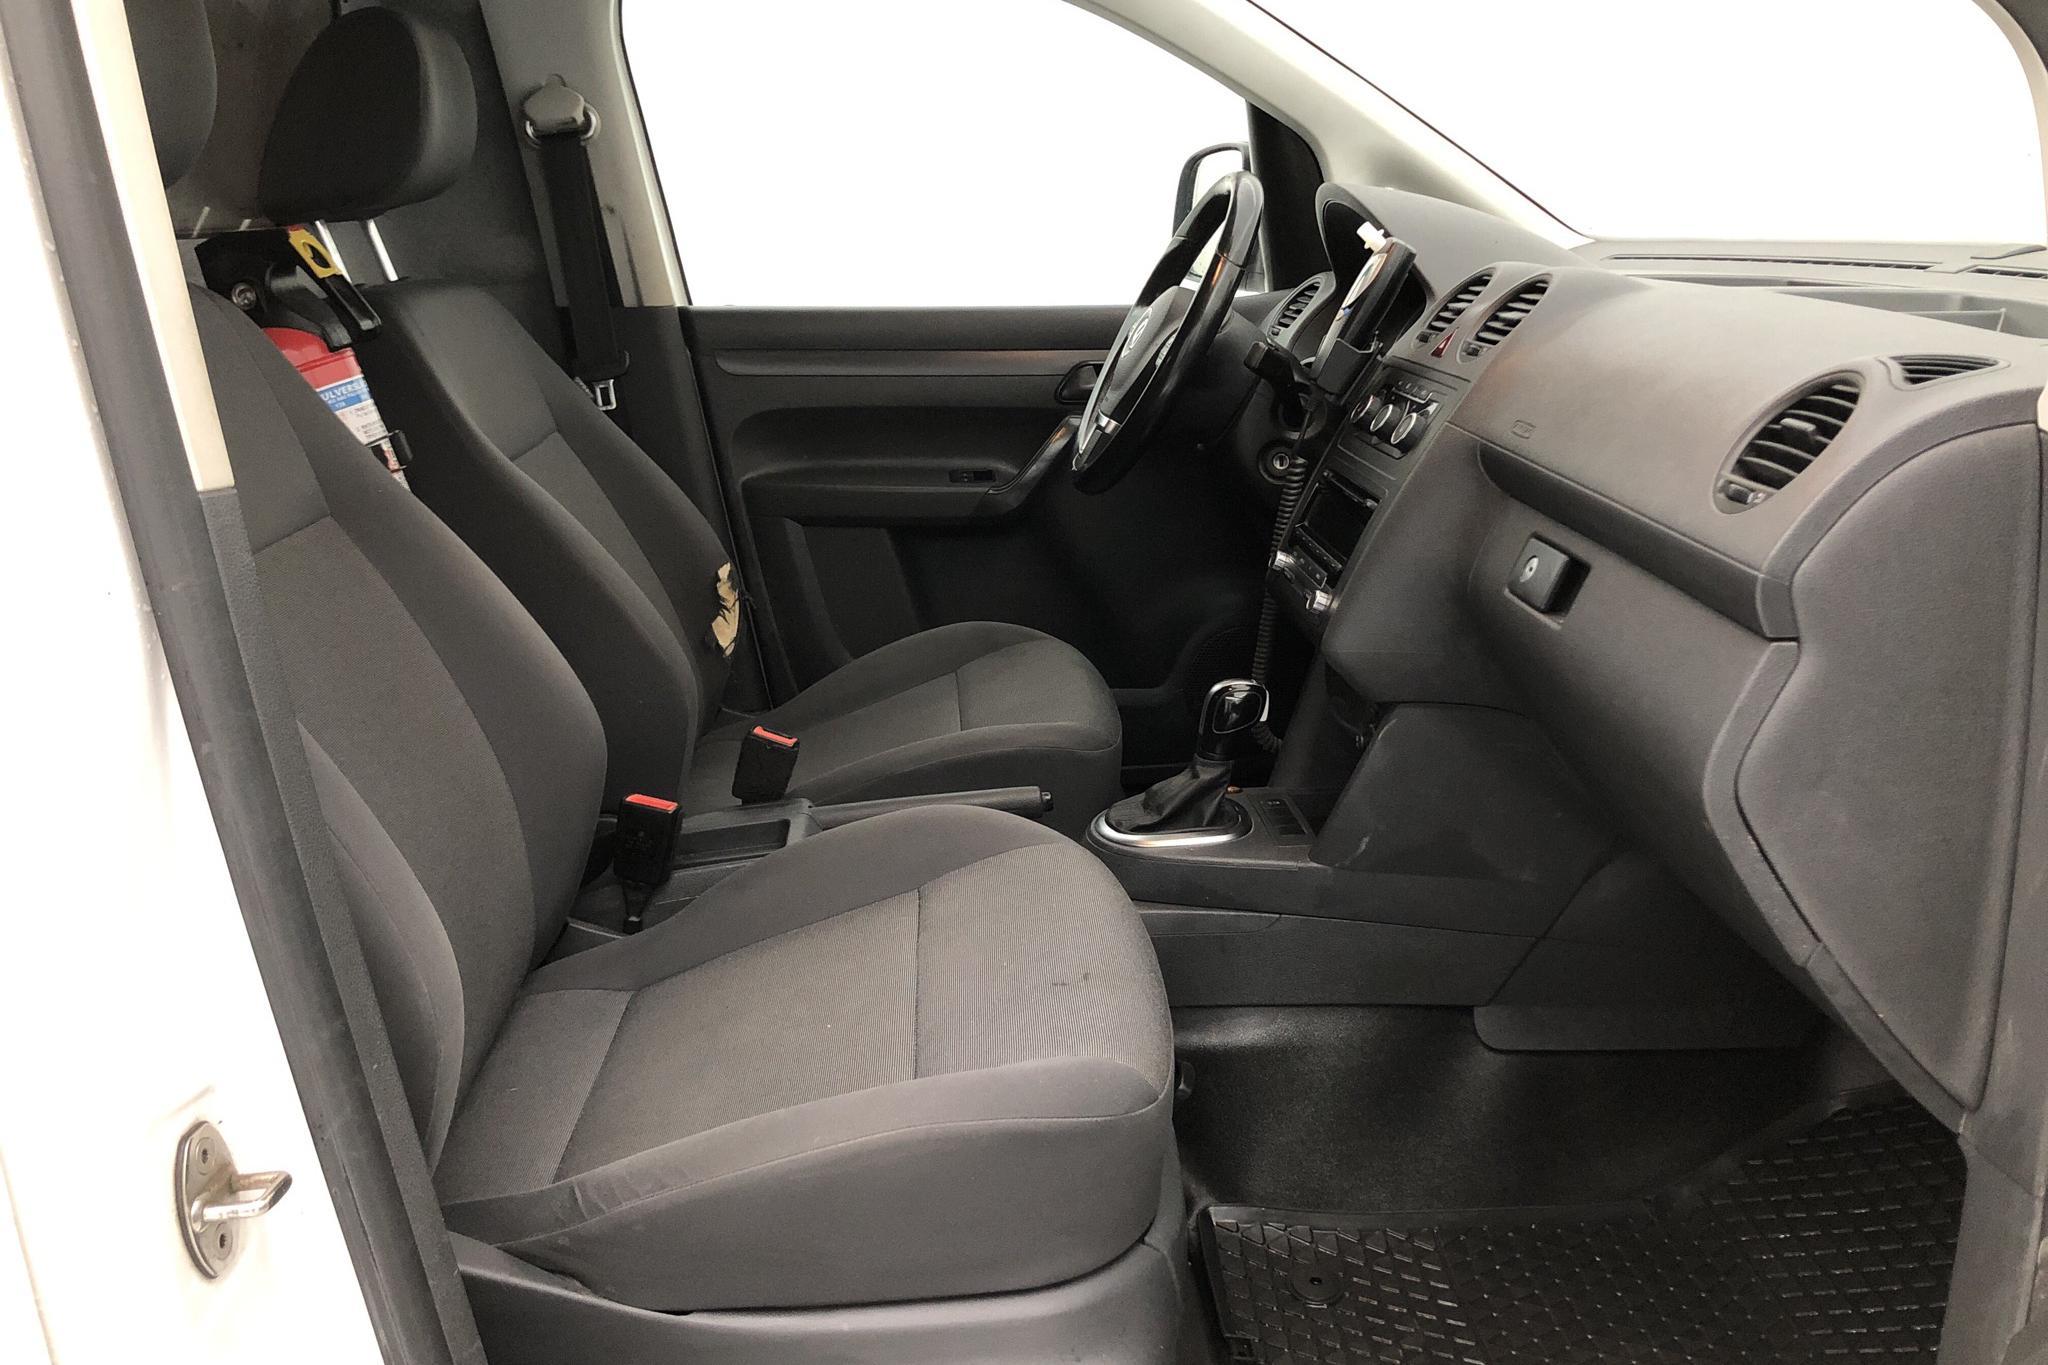 VW Caddy 1.6 TDI Maxi Skåp (102hk) - 65 100 km - Automatic - white - 2015